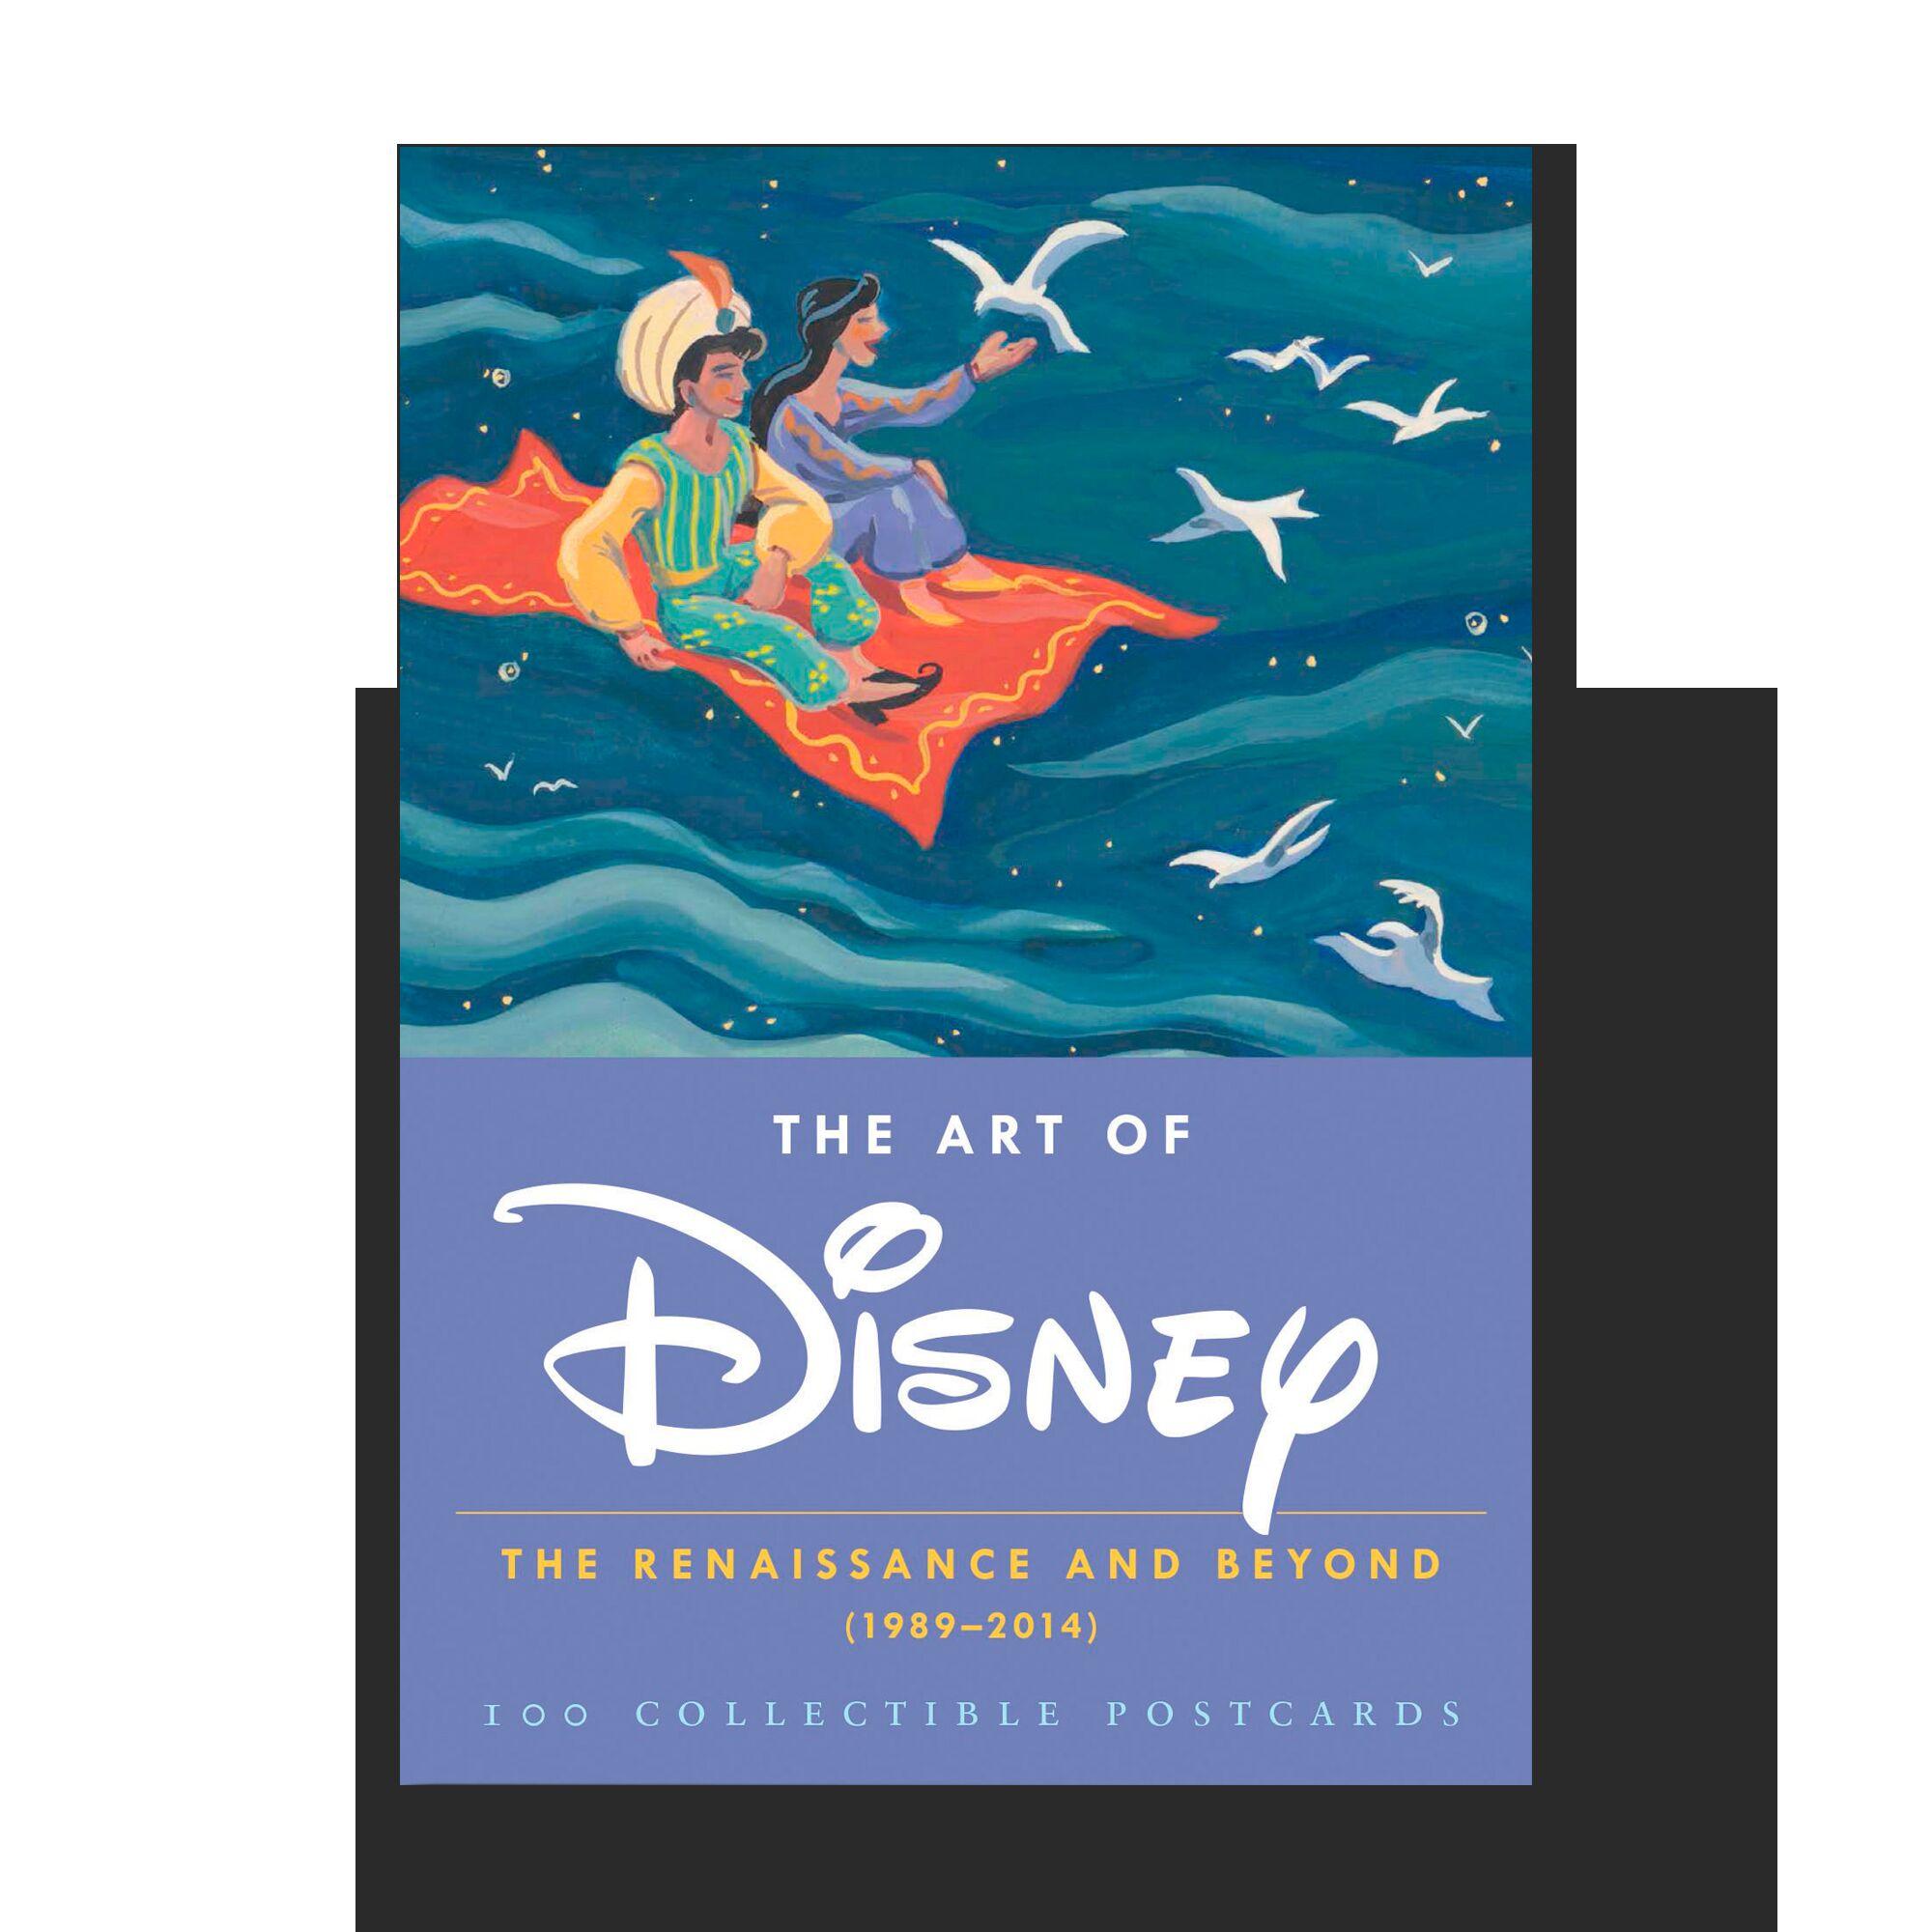 The Art of Disney Postcards